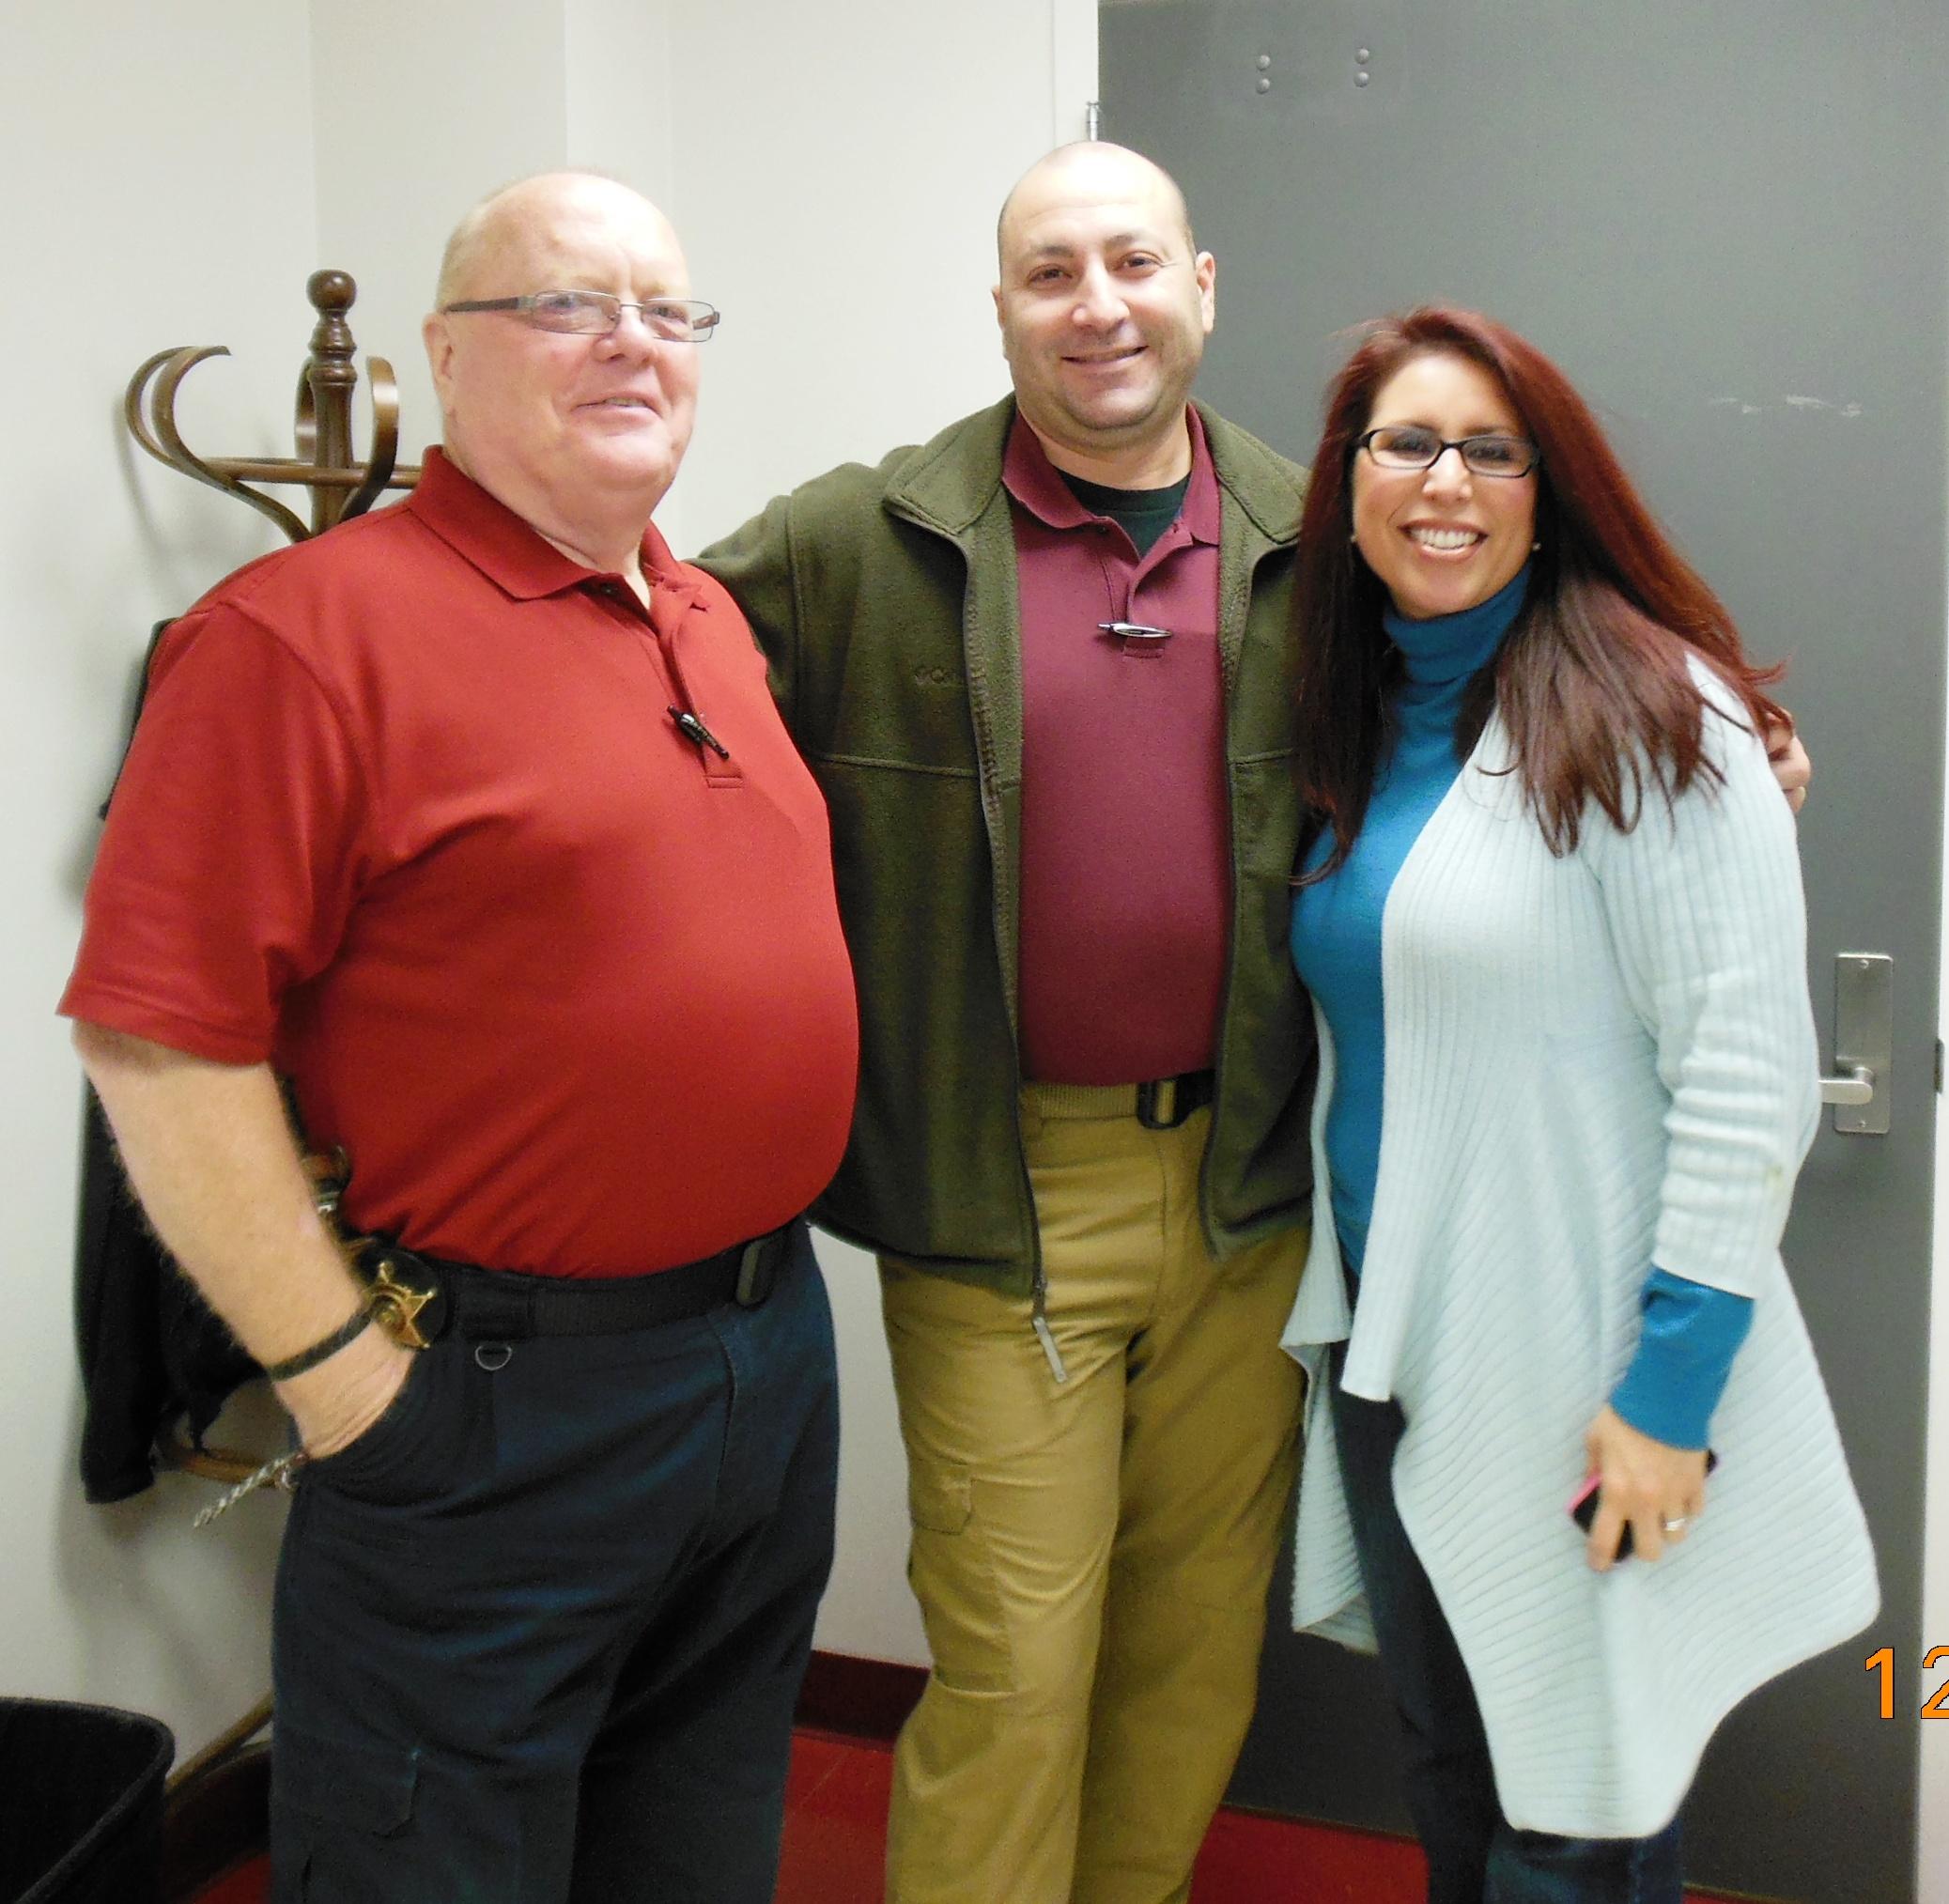 Richard, James & Tammy.JPG